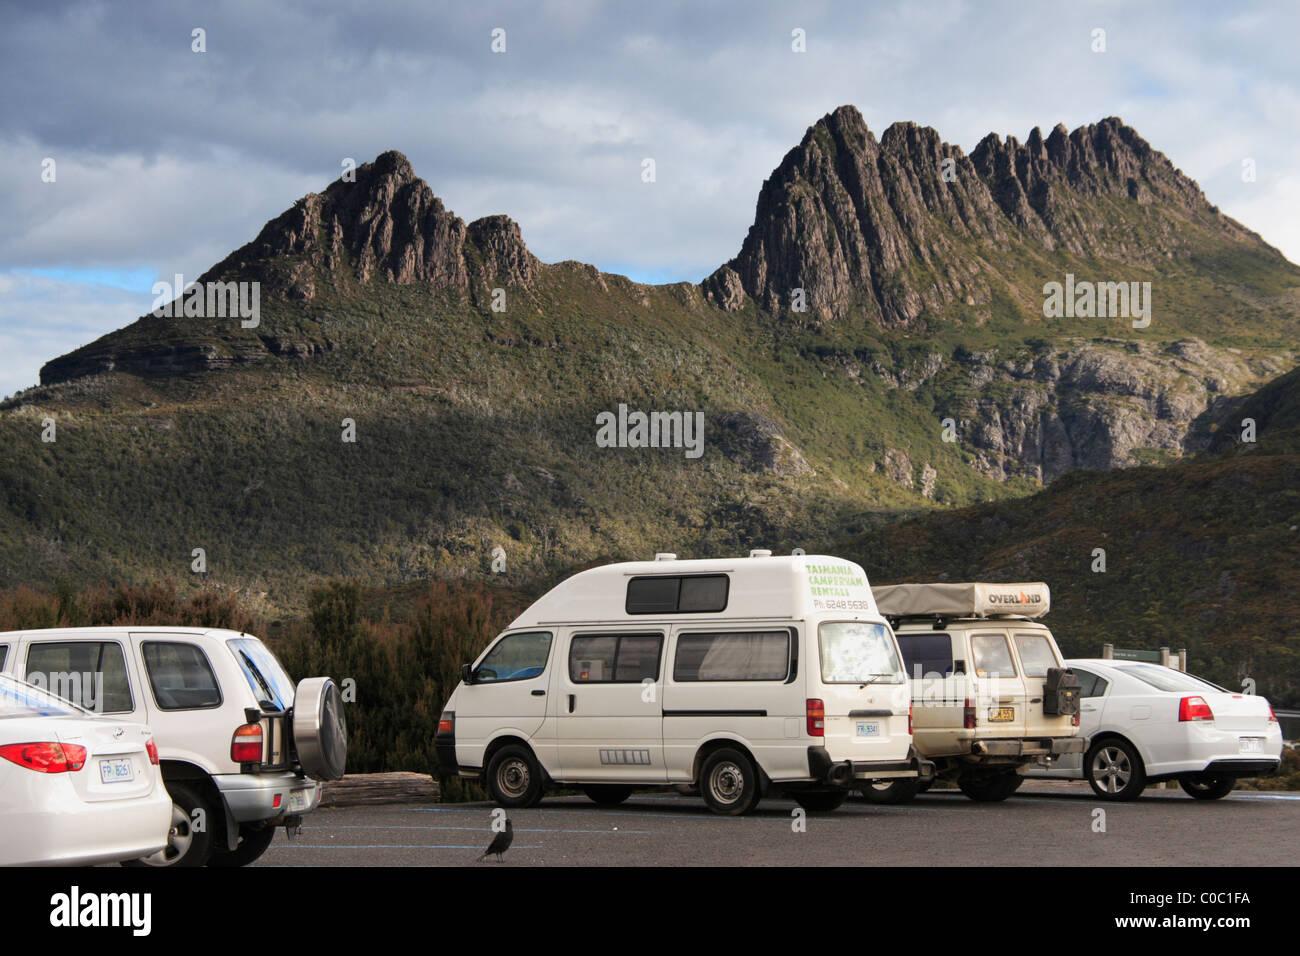 Cradle Mountain National Park Car Park. - Stock Image